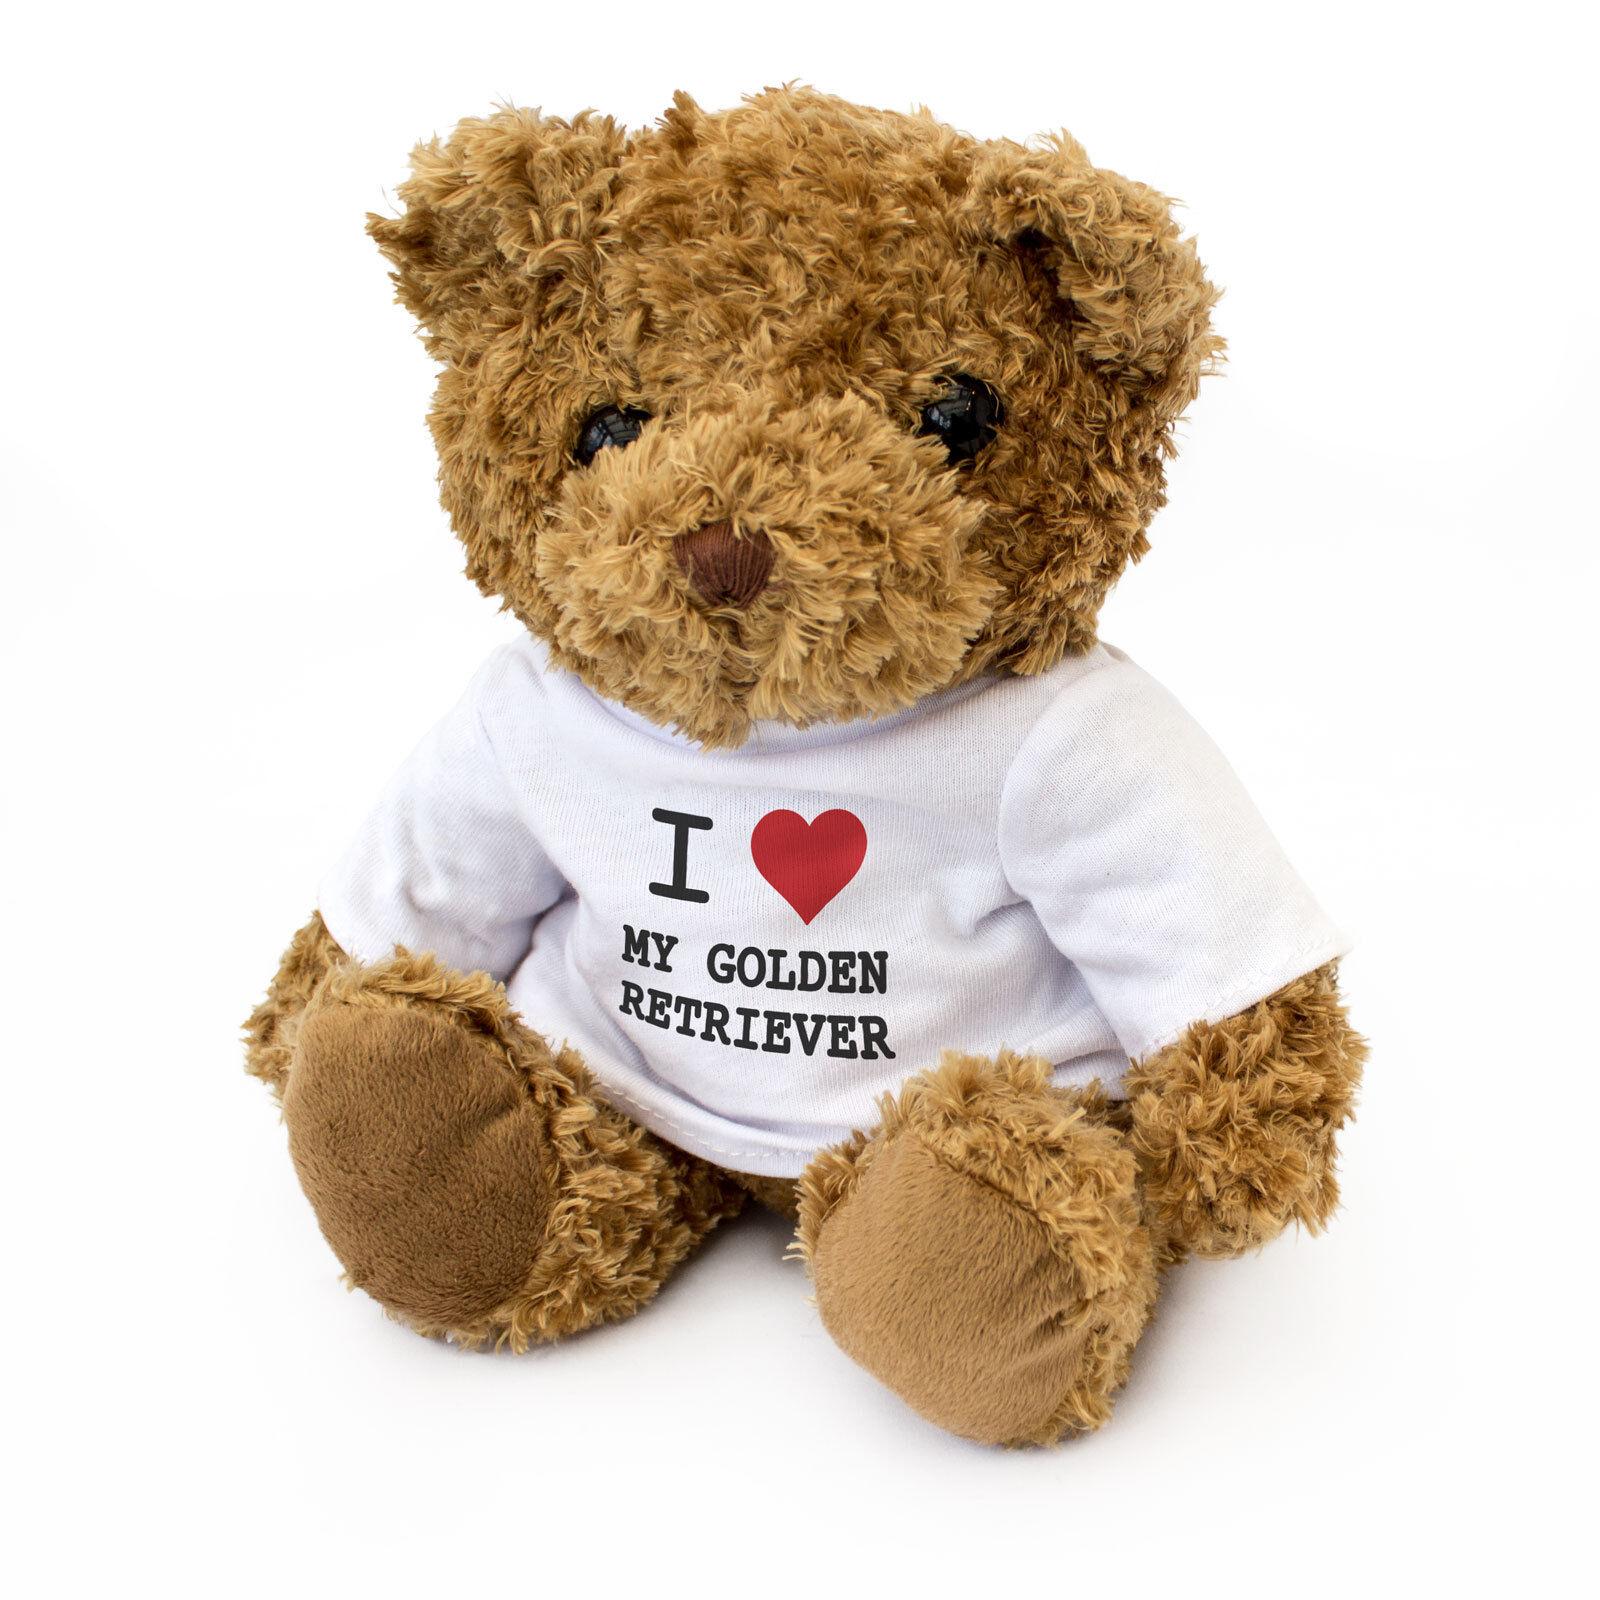 Nuevo-me encanta mi Golden Retriever-Lindo Retriever-Lindo Retriever-Lindo Y Tierno Oso De Peluche-Regalo Presente 126da8